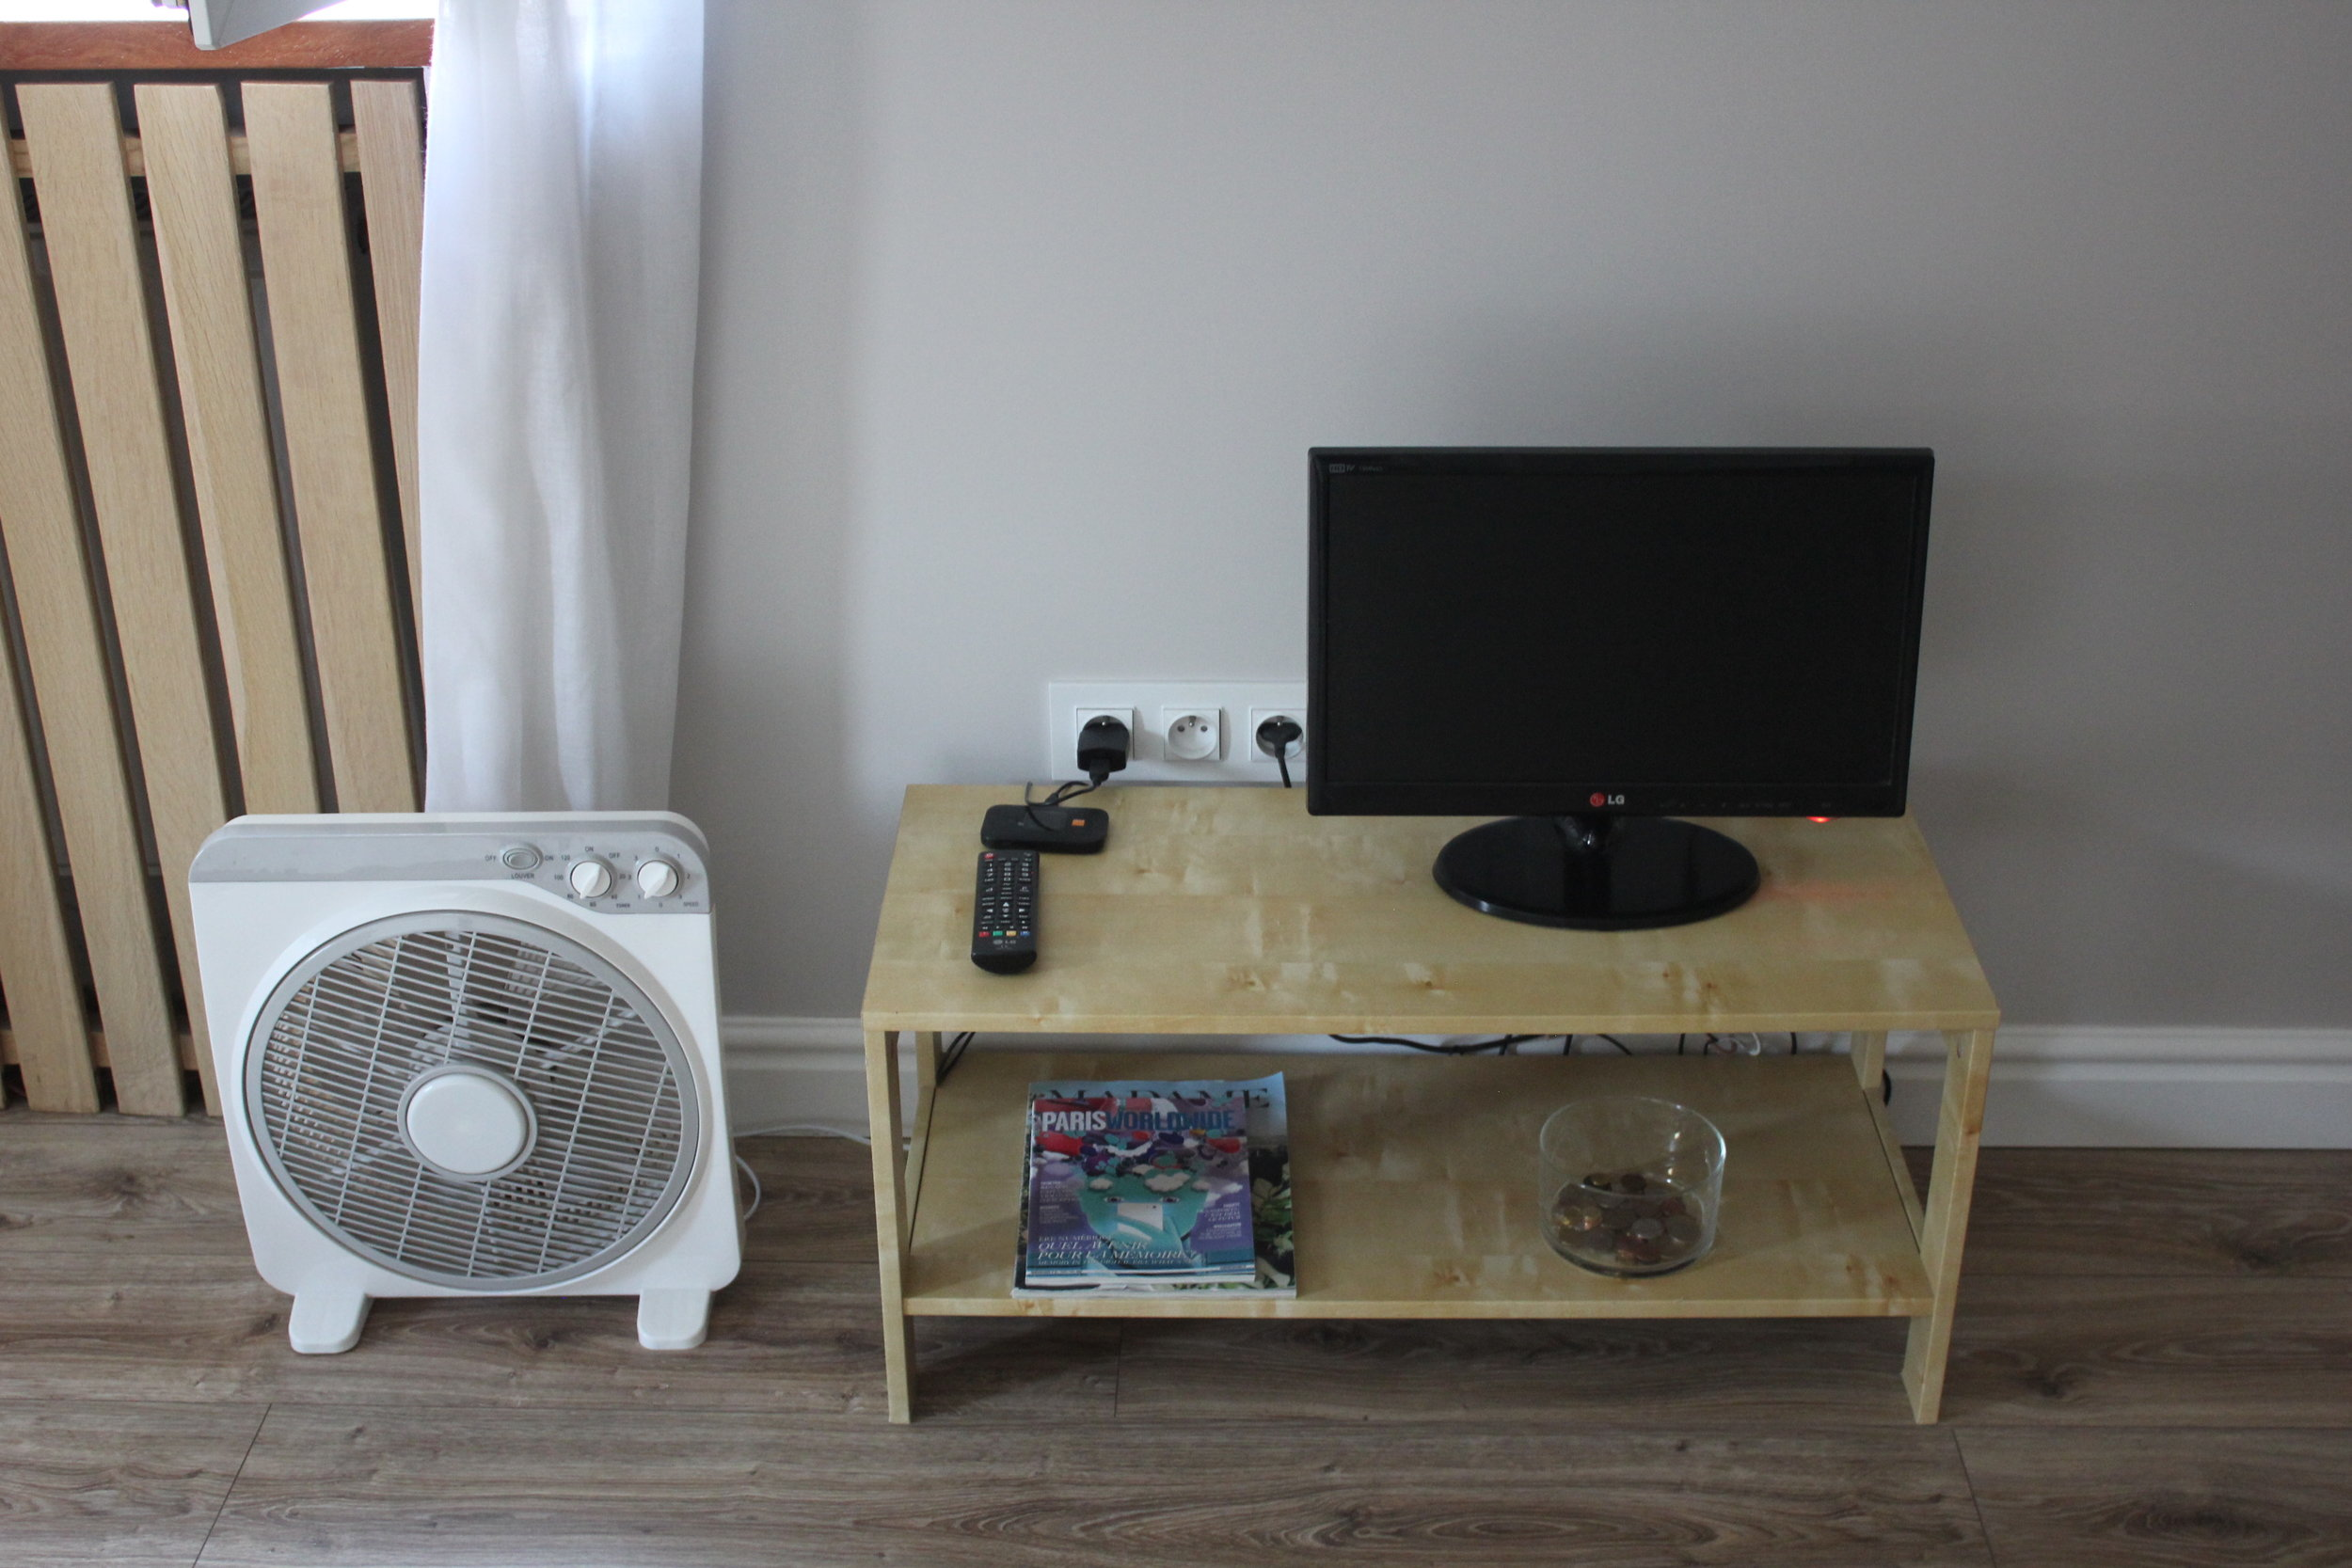 Apartament na Mariensztacie – TV set